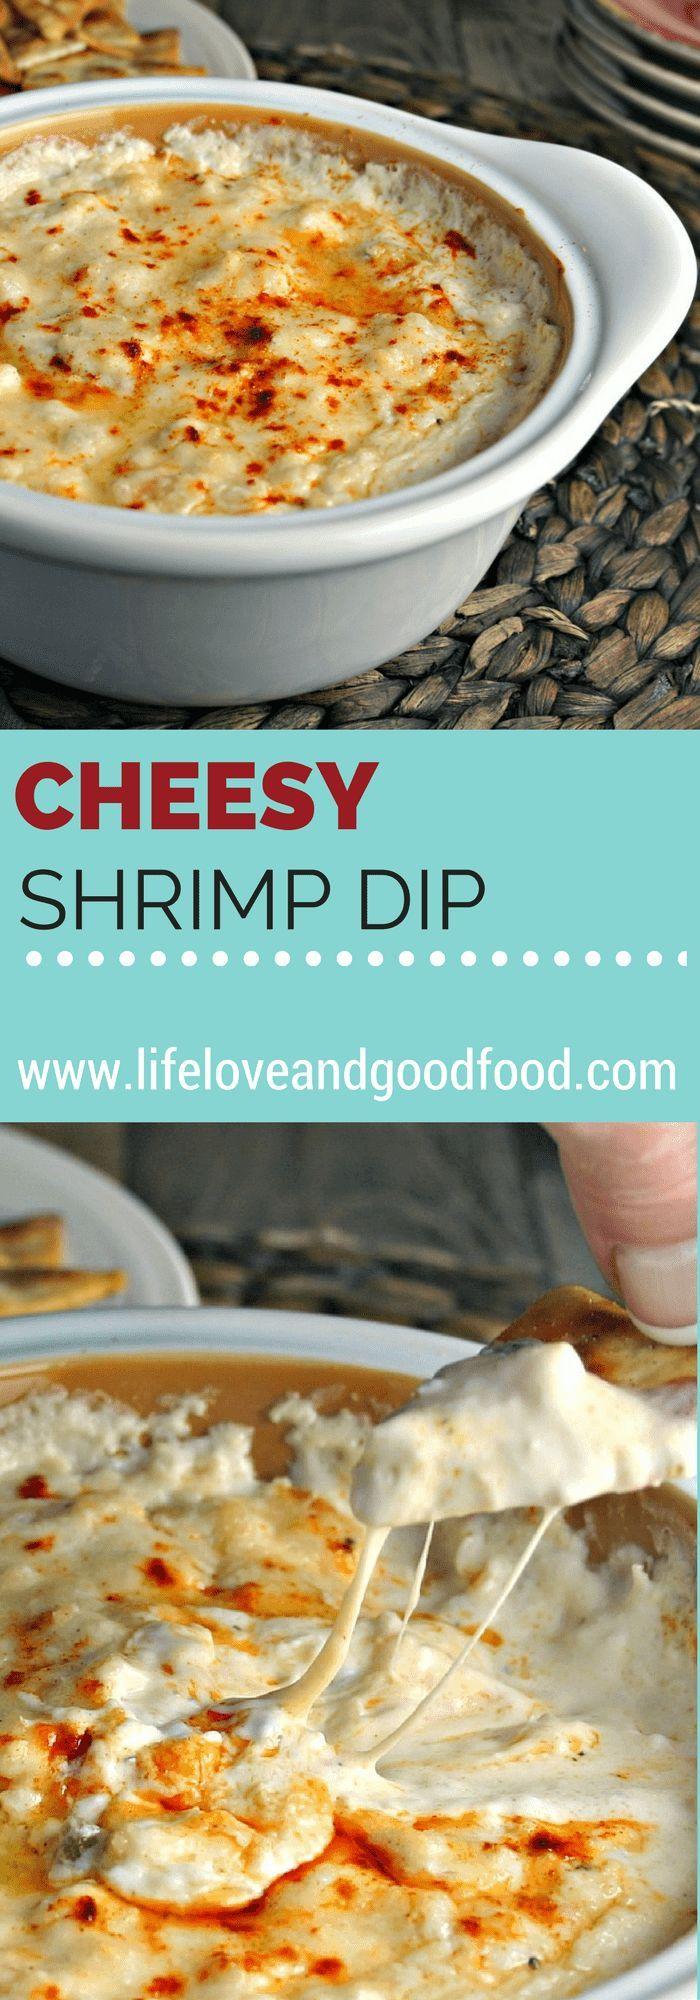 Cheesy Shrimp Dip #shrimpdip